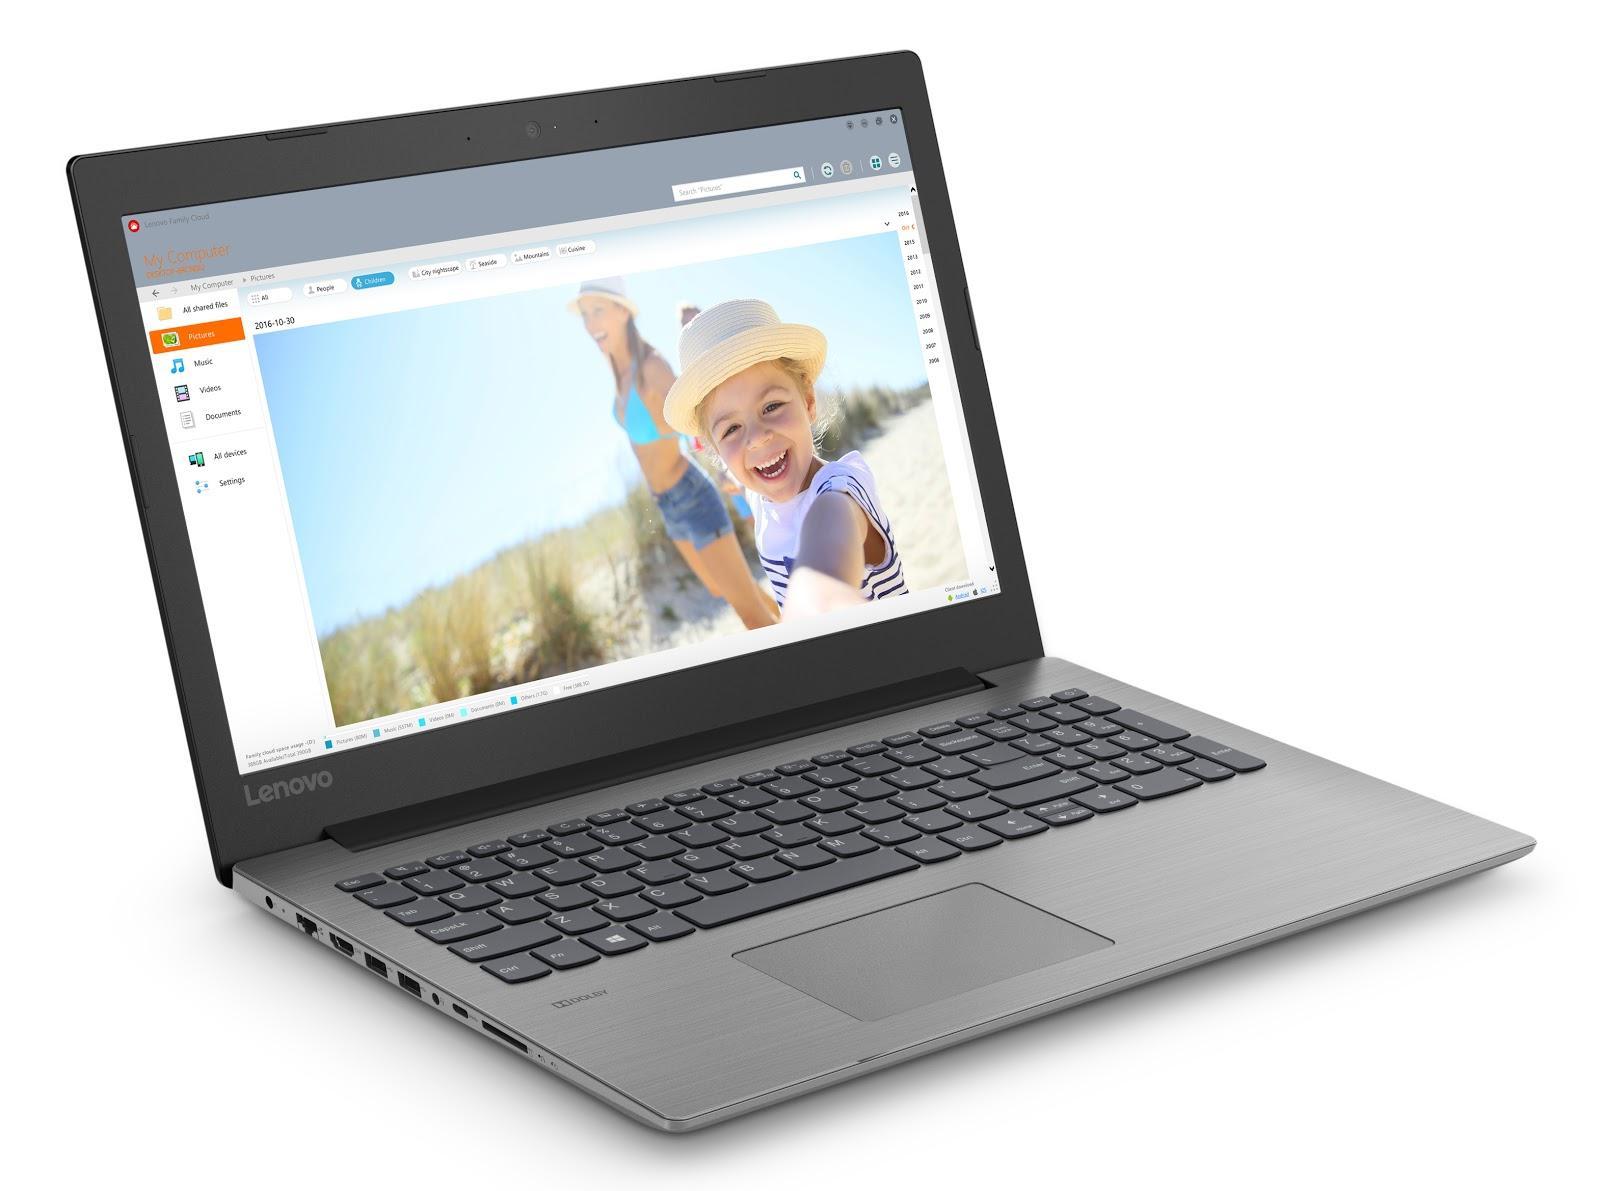 Фото 2. Ноутбук Lenovo ideapad 330-15 Onyx Black (81DE01PKRA)